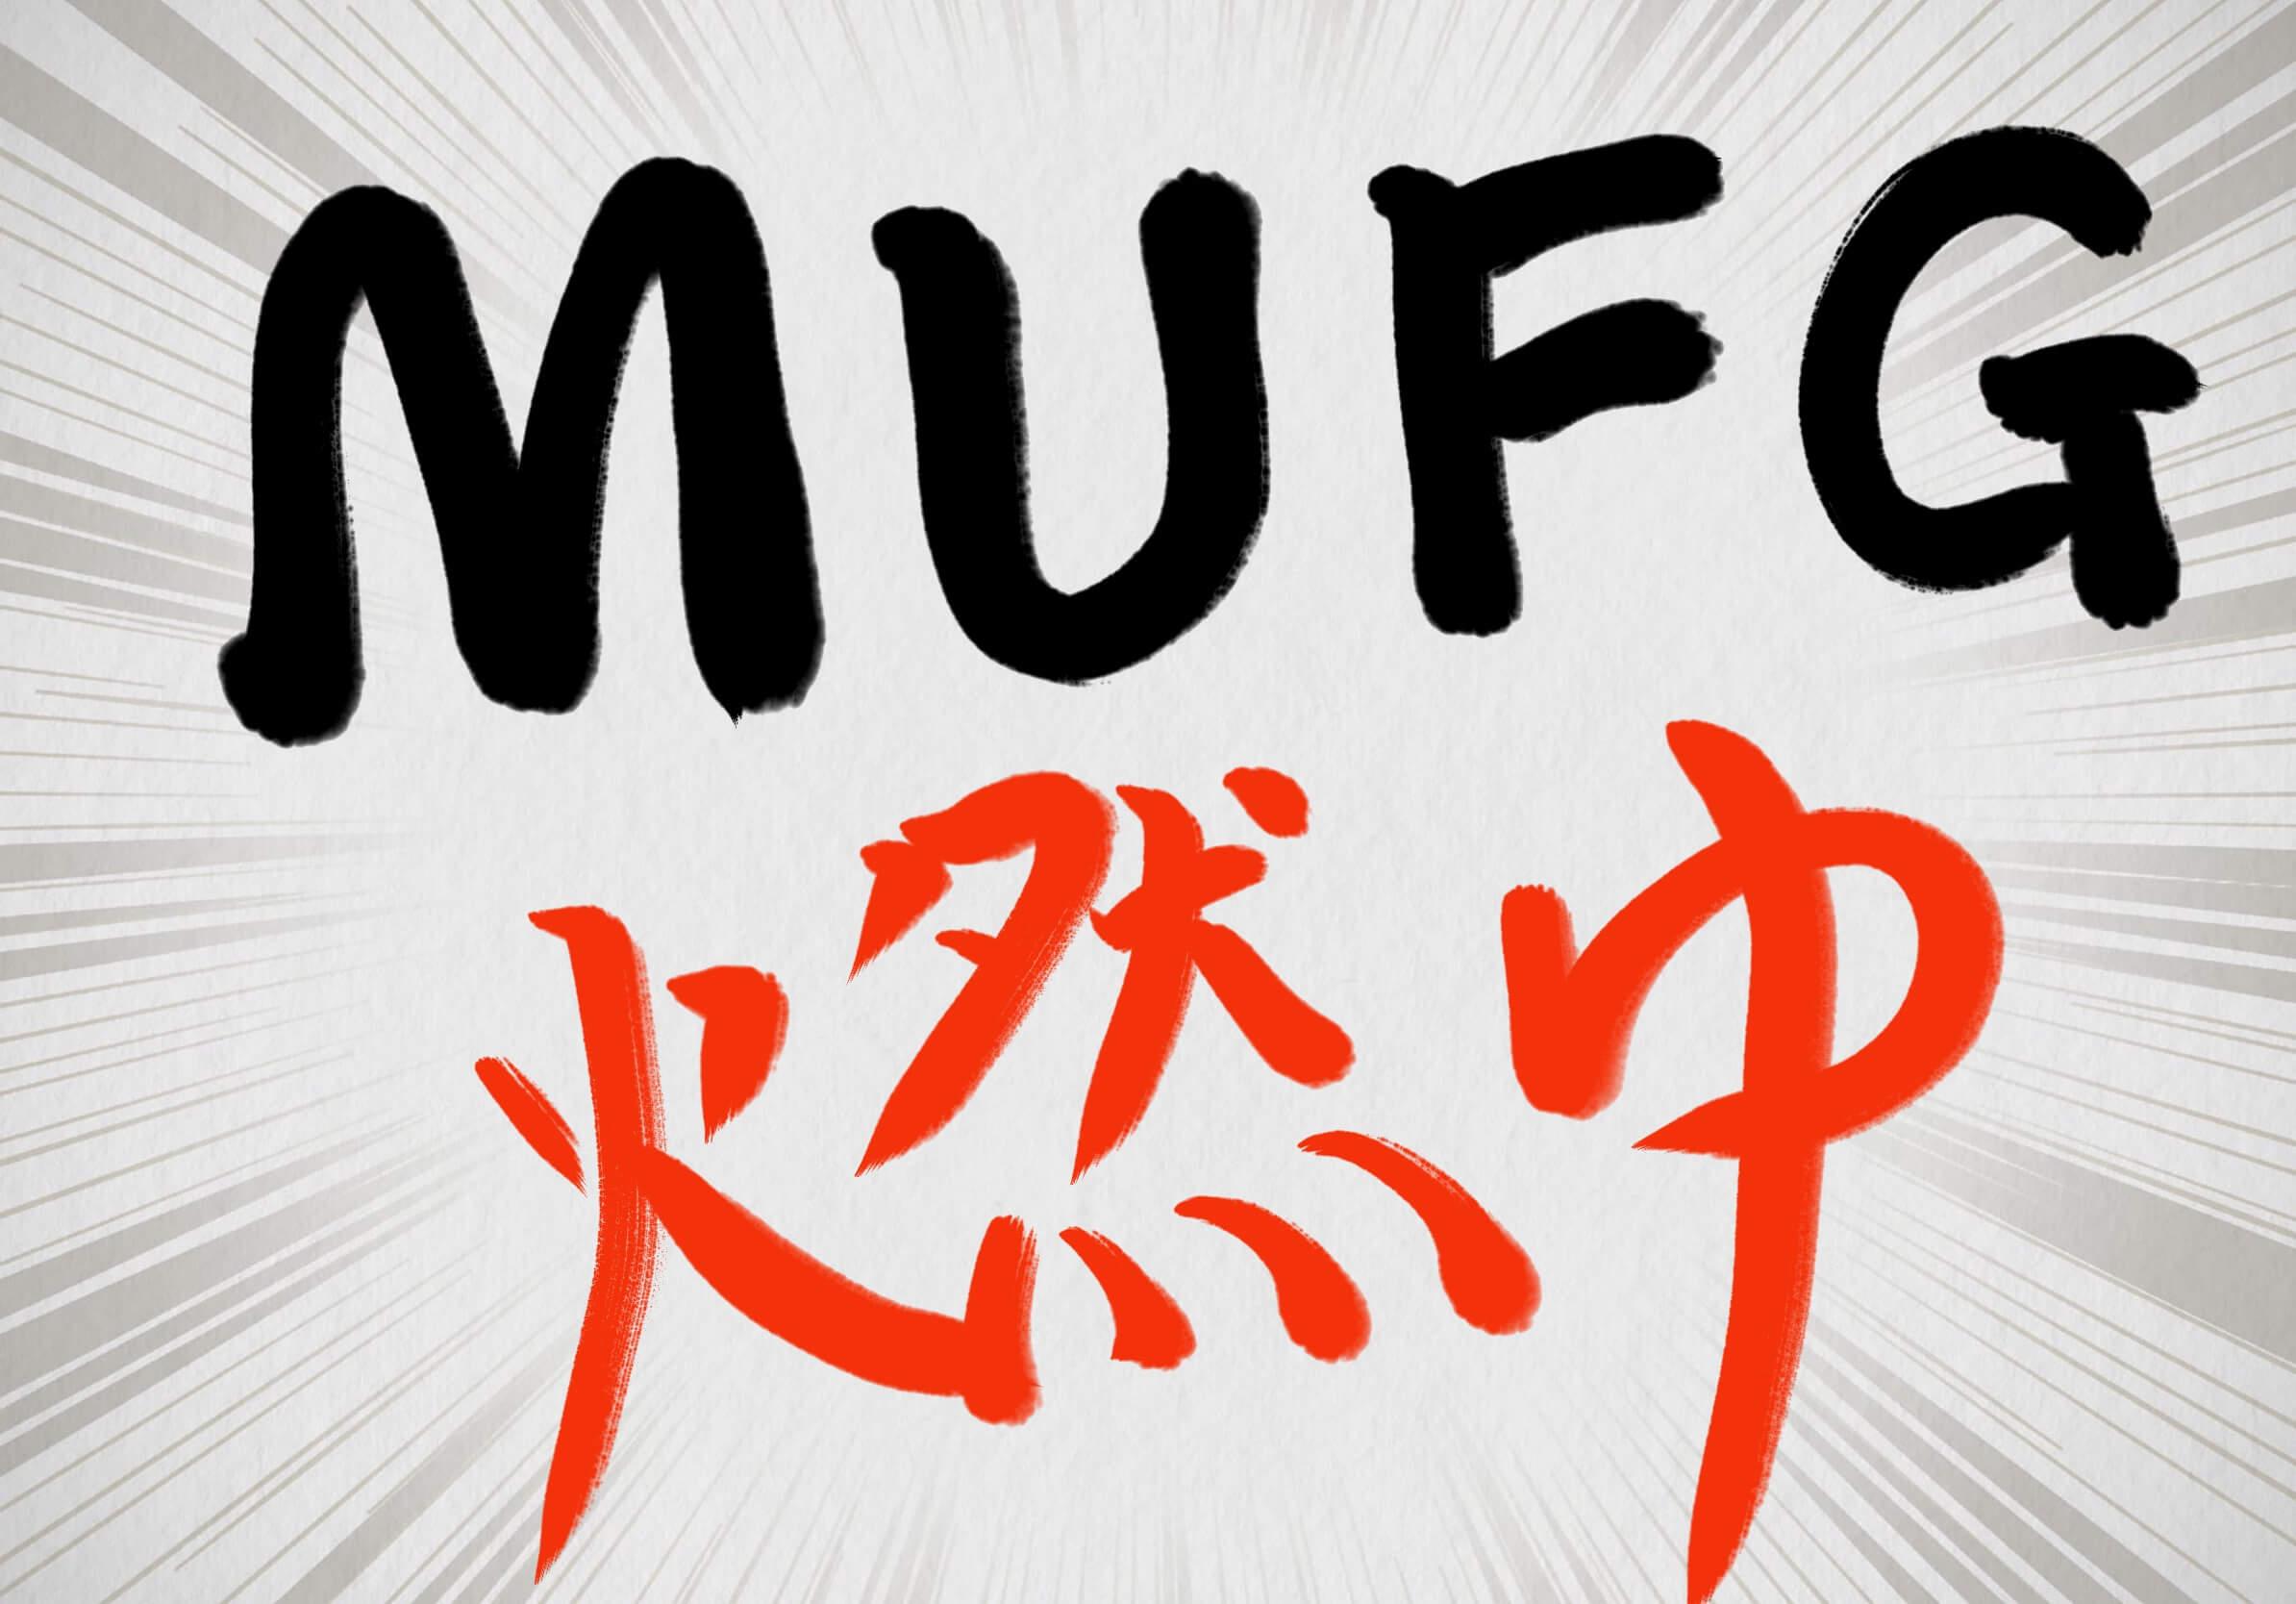 MUFG公式アプリが大炎上🔥評価星1つが圧倒。理由に迫る。